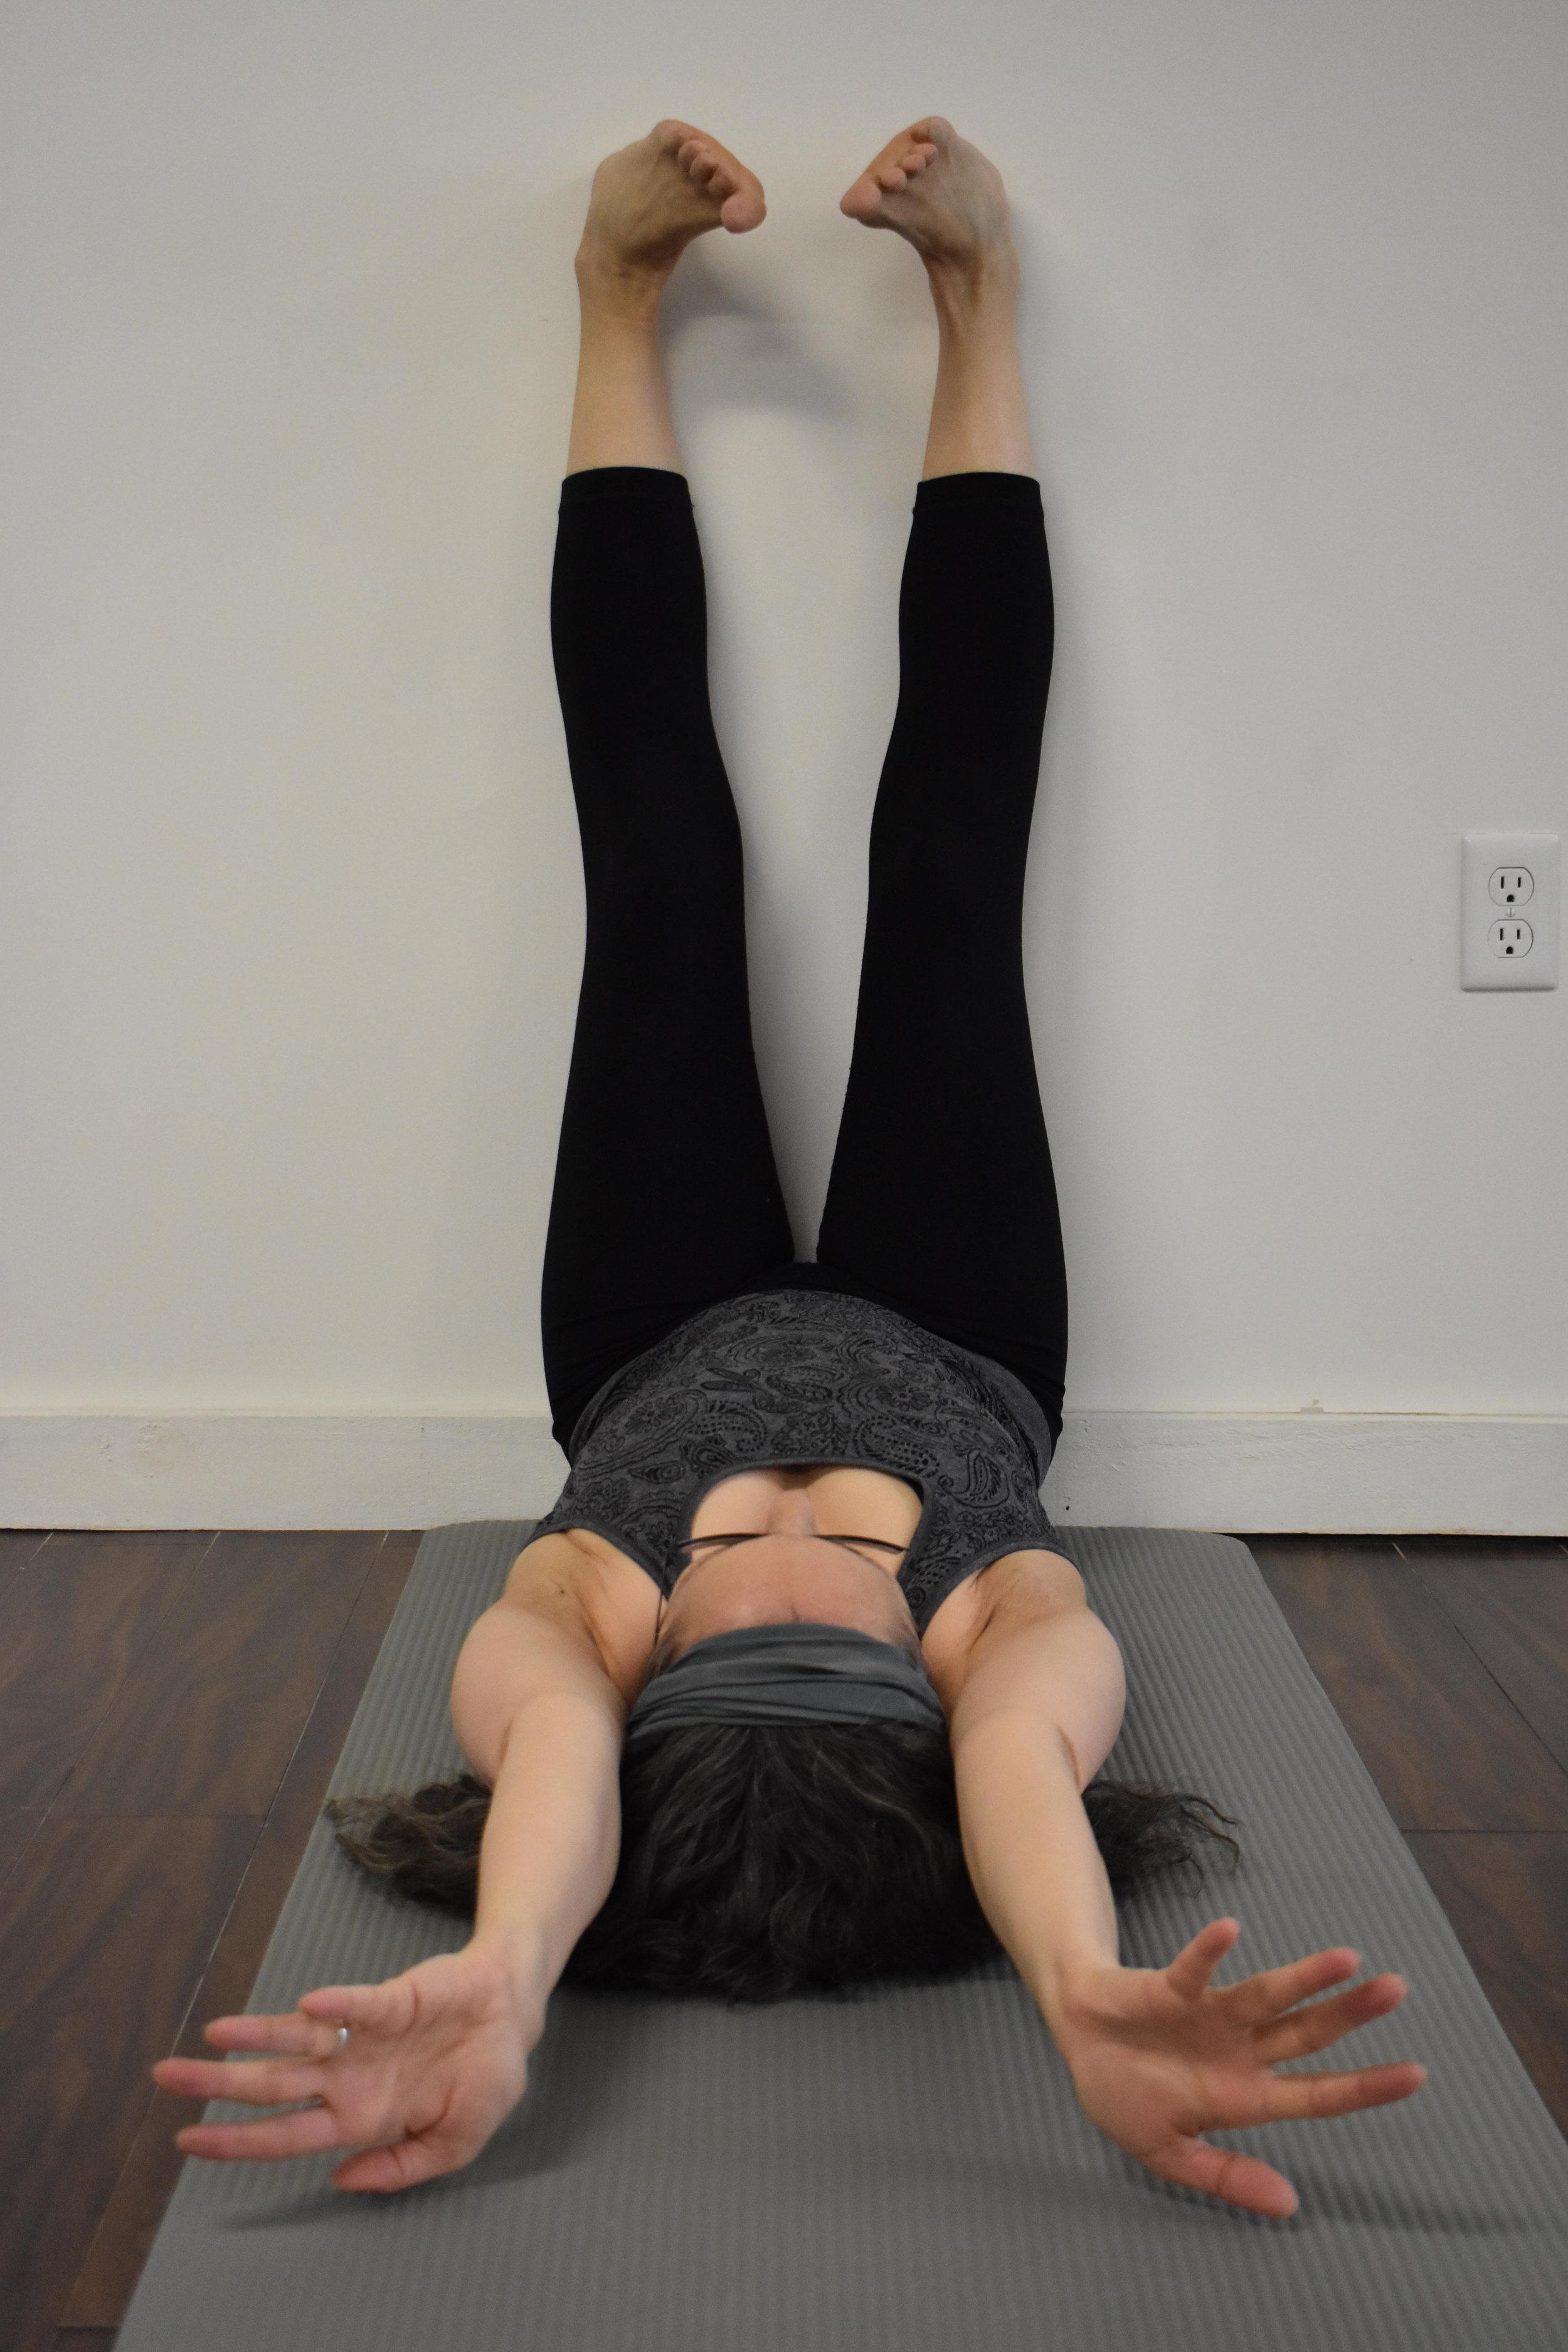 ELDOA with Manuela Soares at Amma Yoga in Kitchener-Waterloo